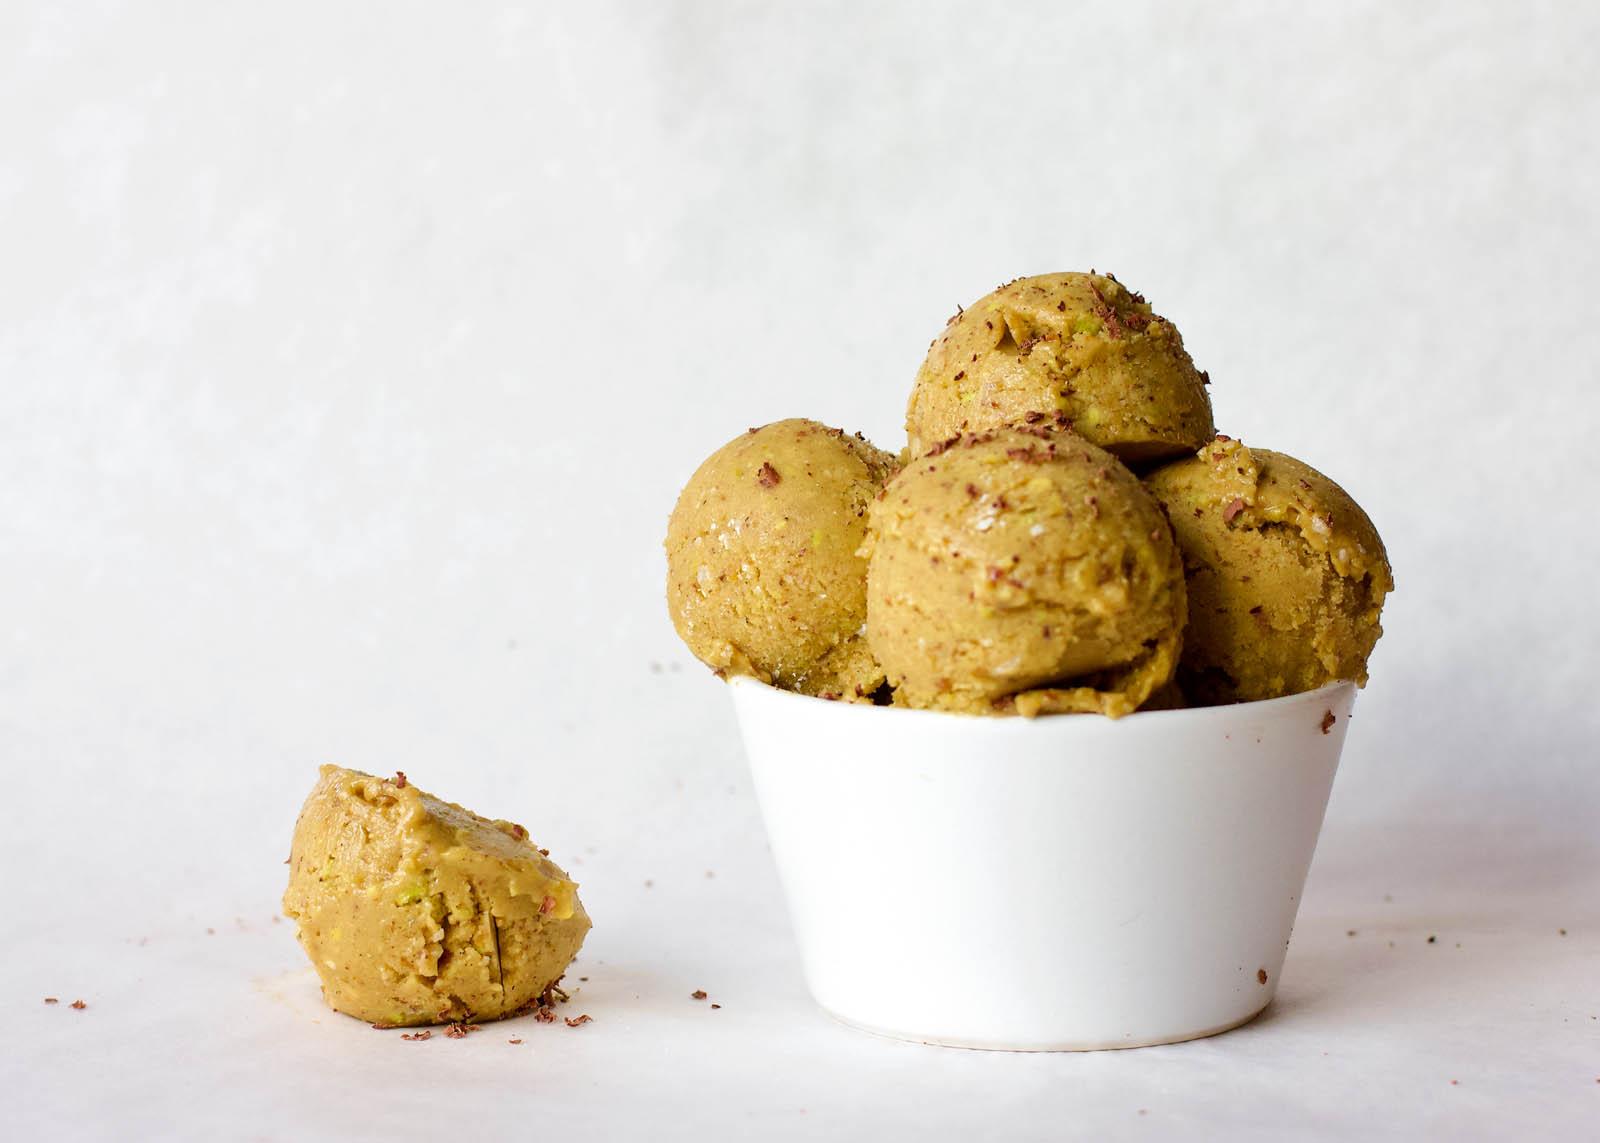 Big serving of Vegan Sweet Peach Ice Cream